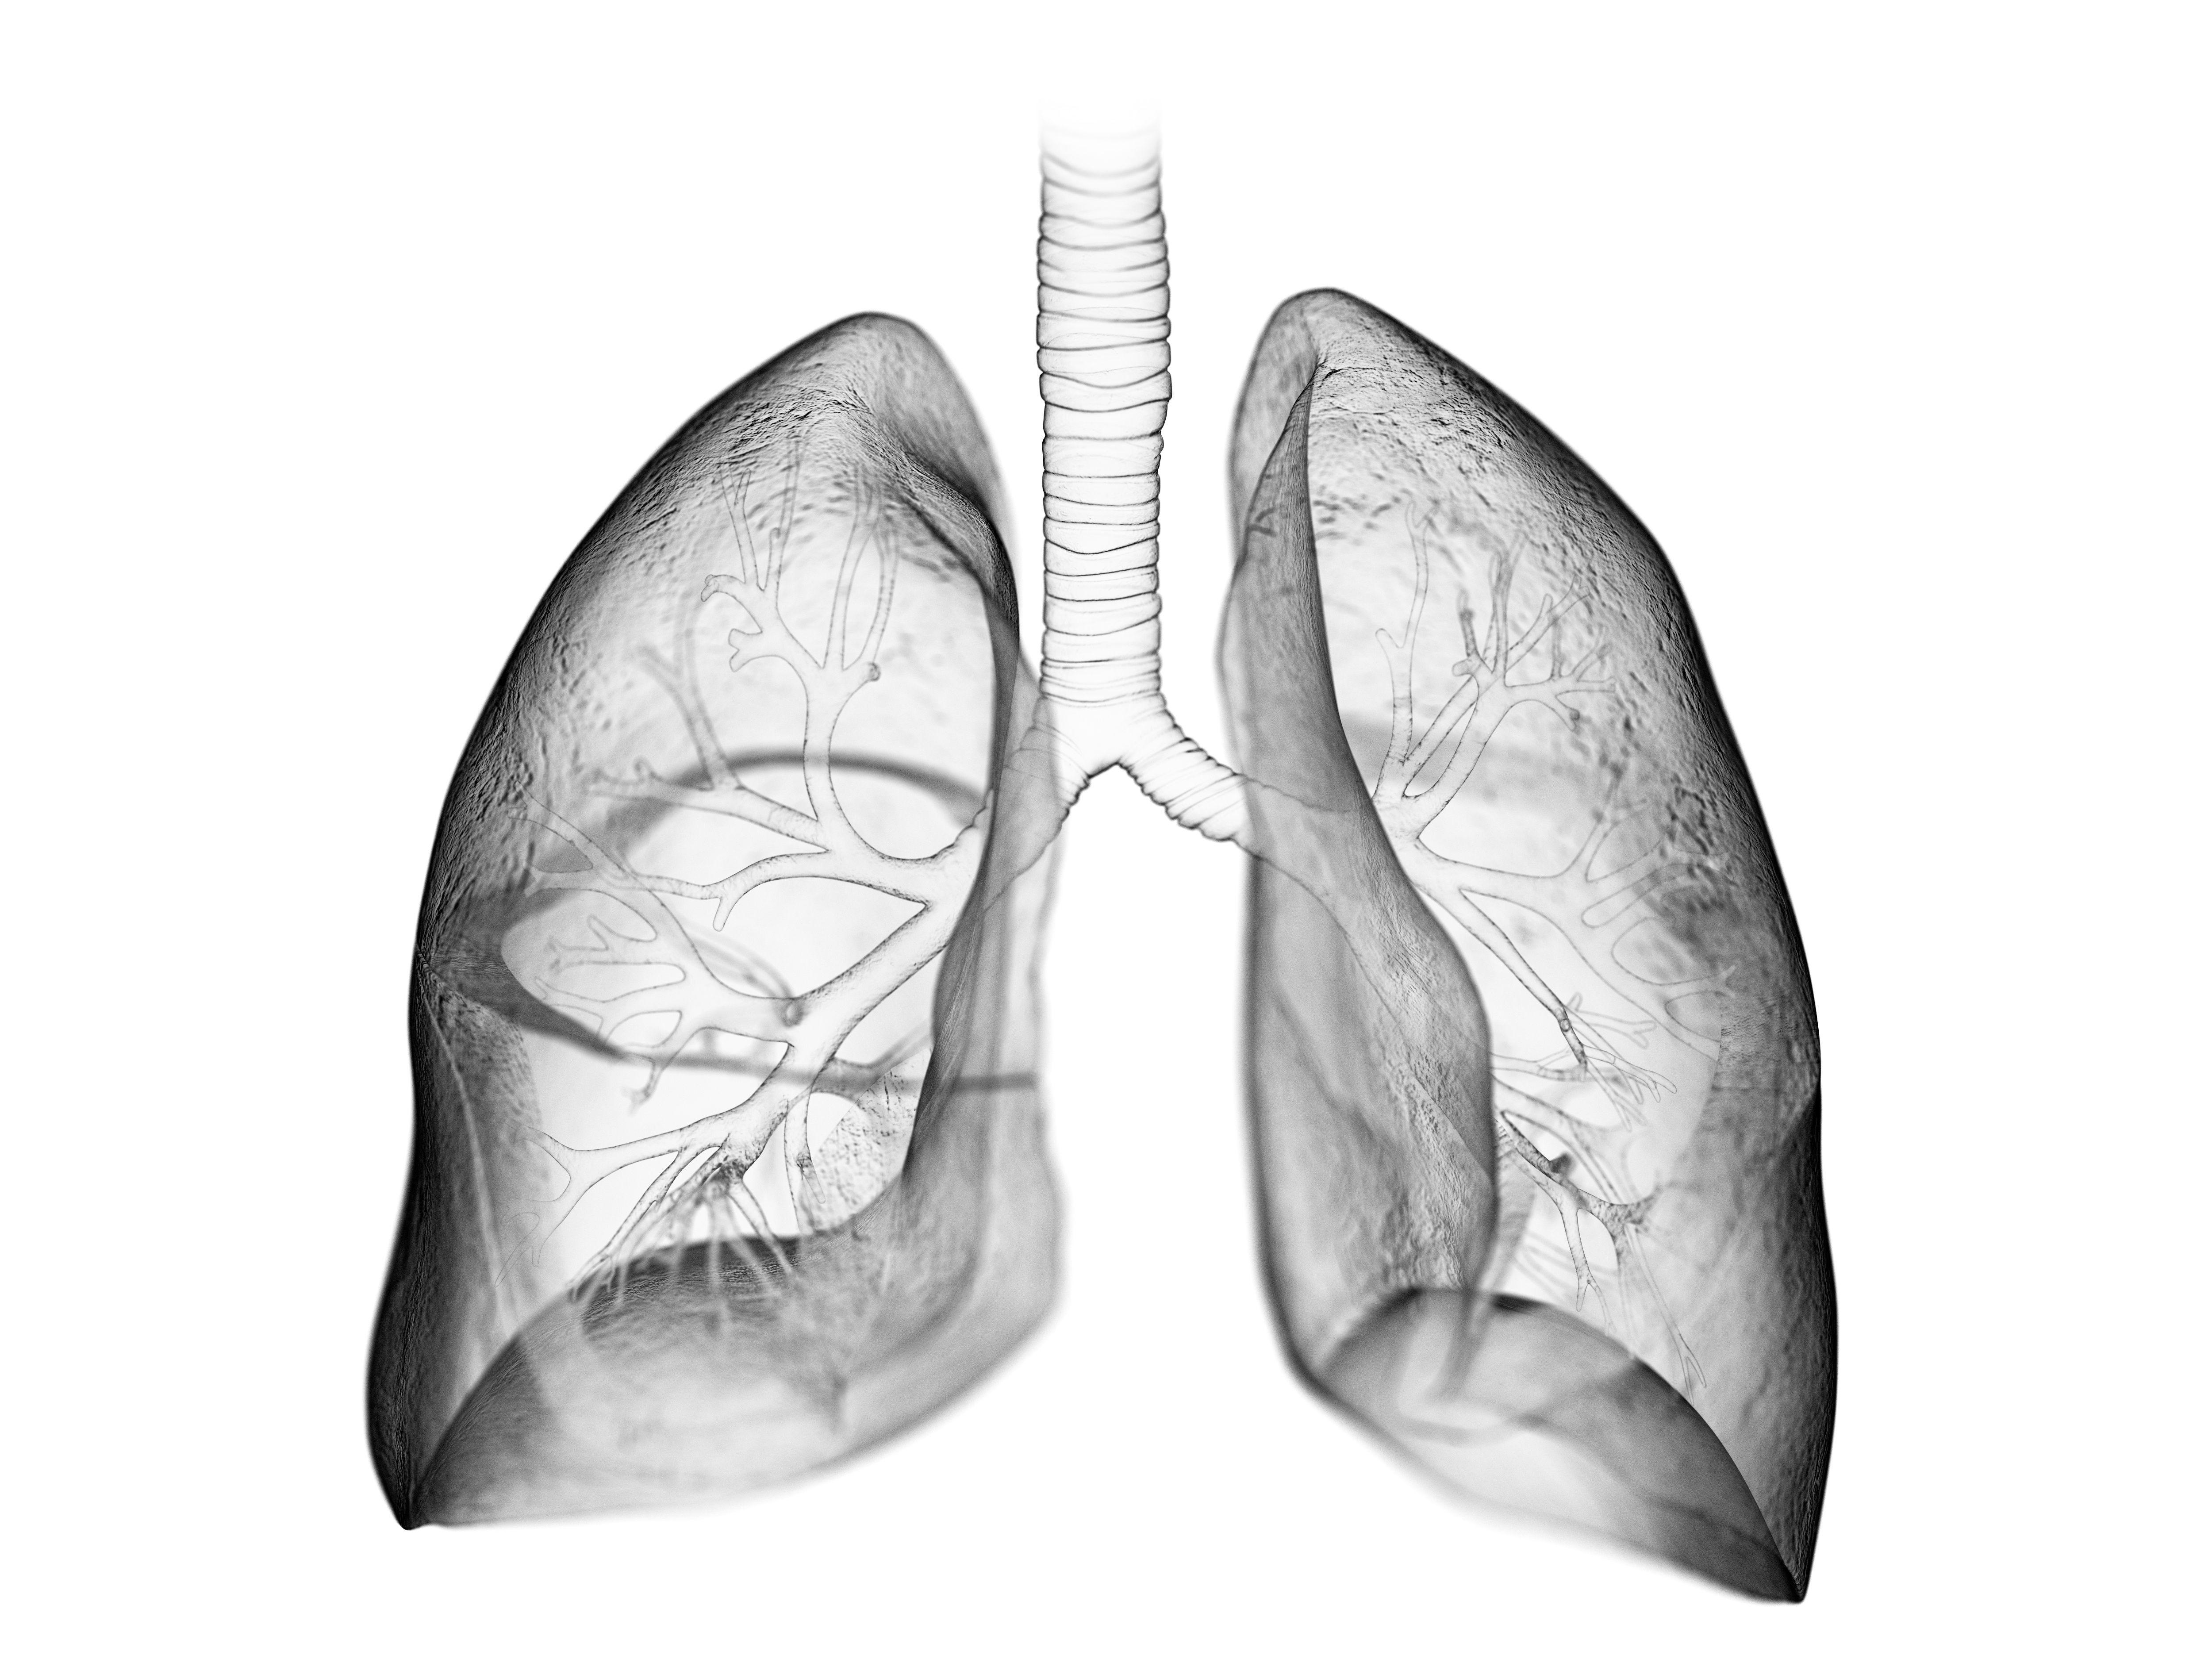 COPD Triples Mortality Risk in RA: